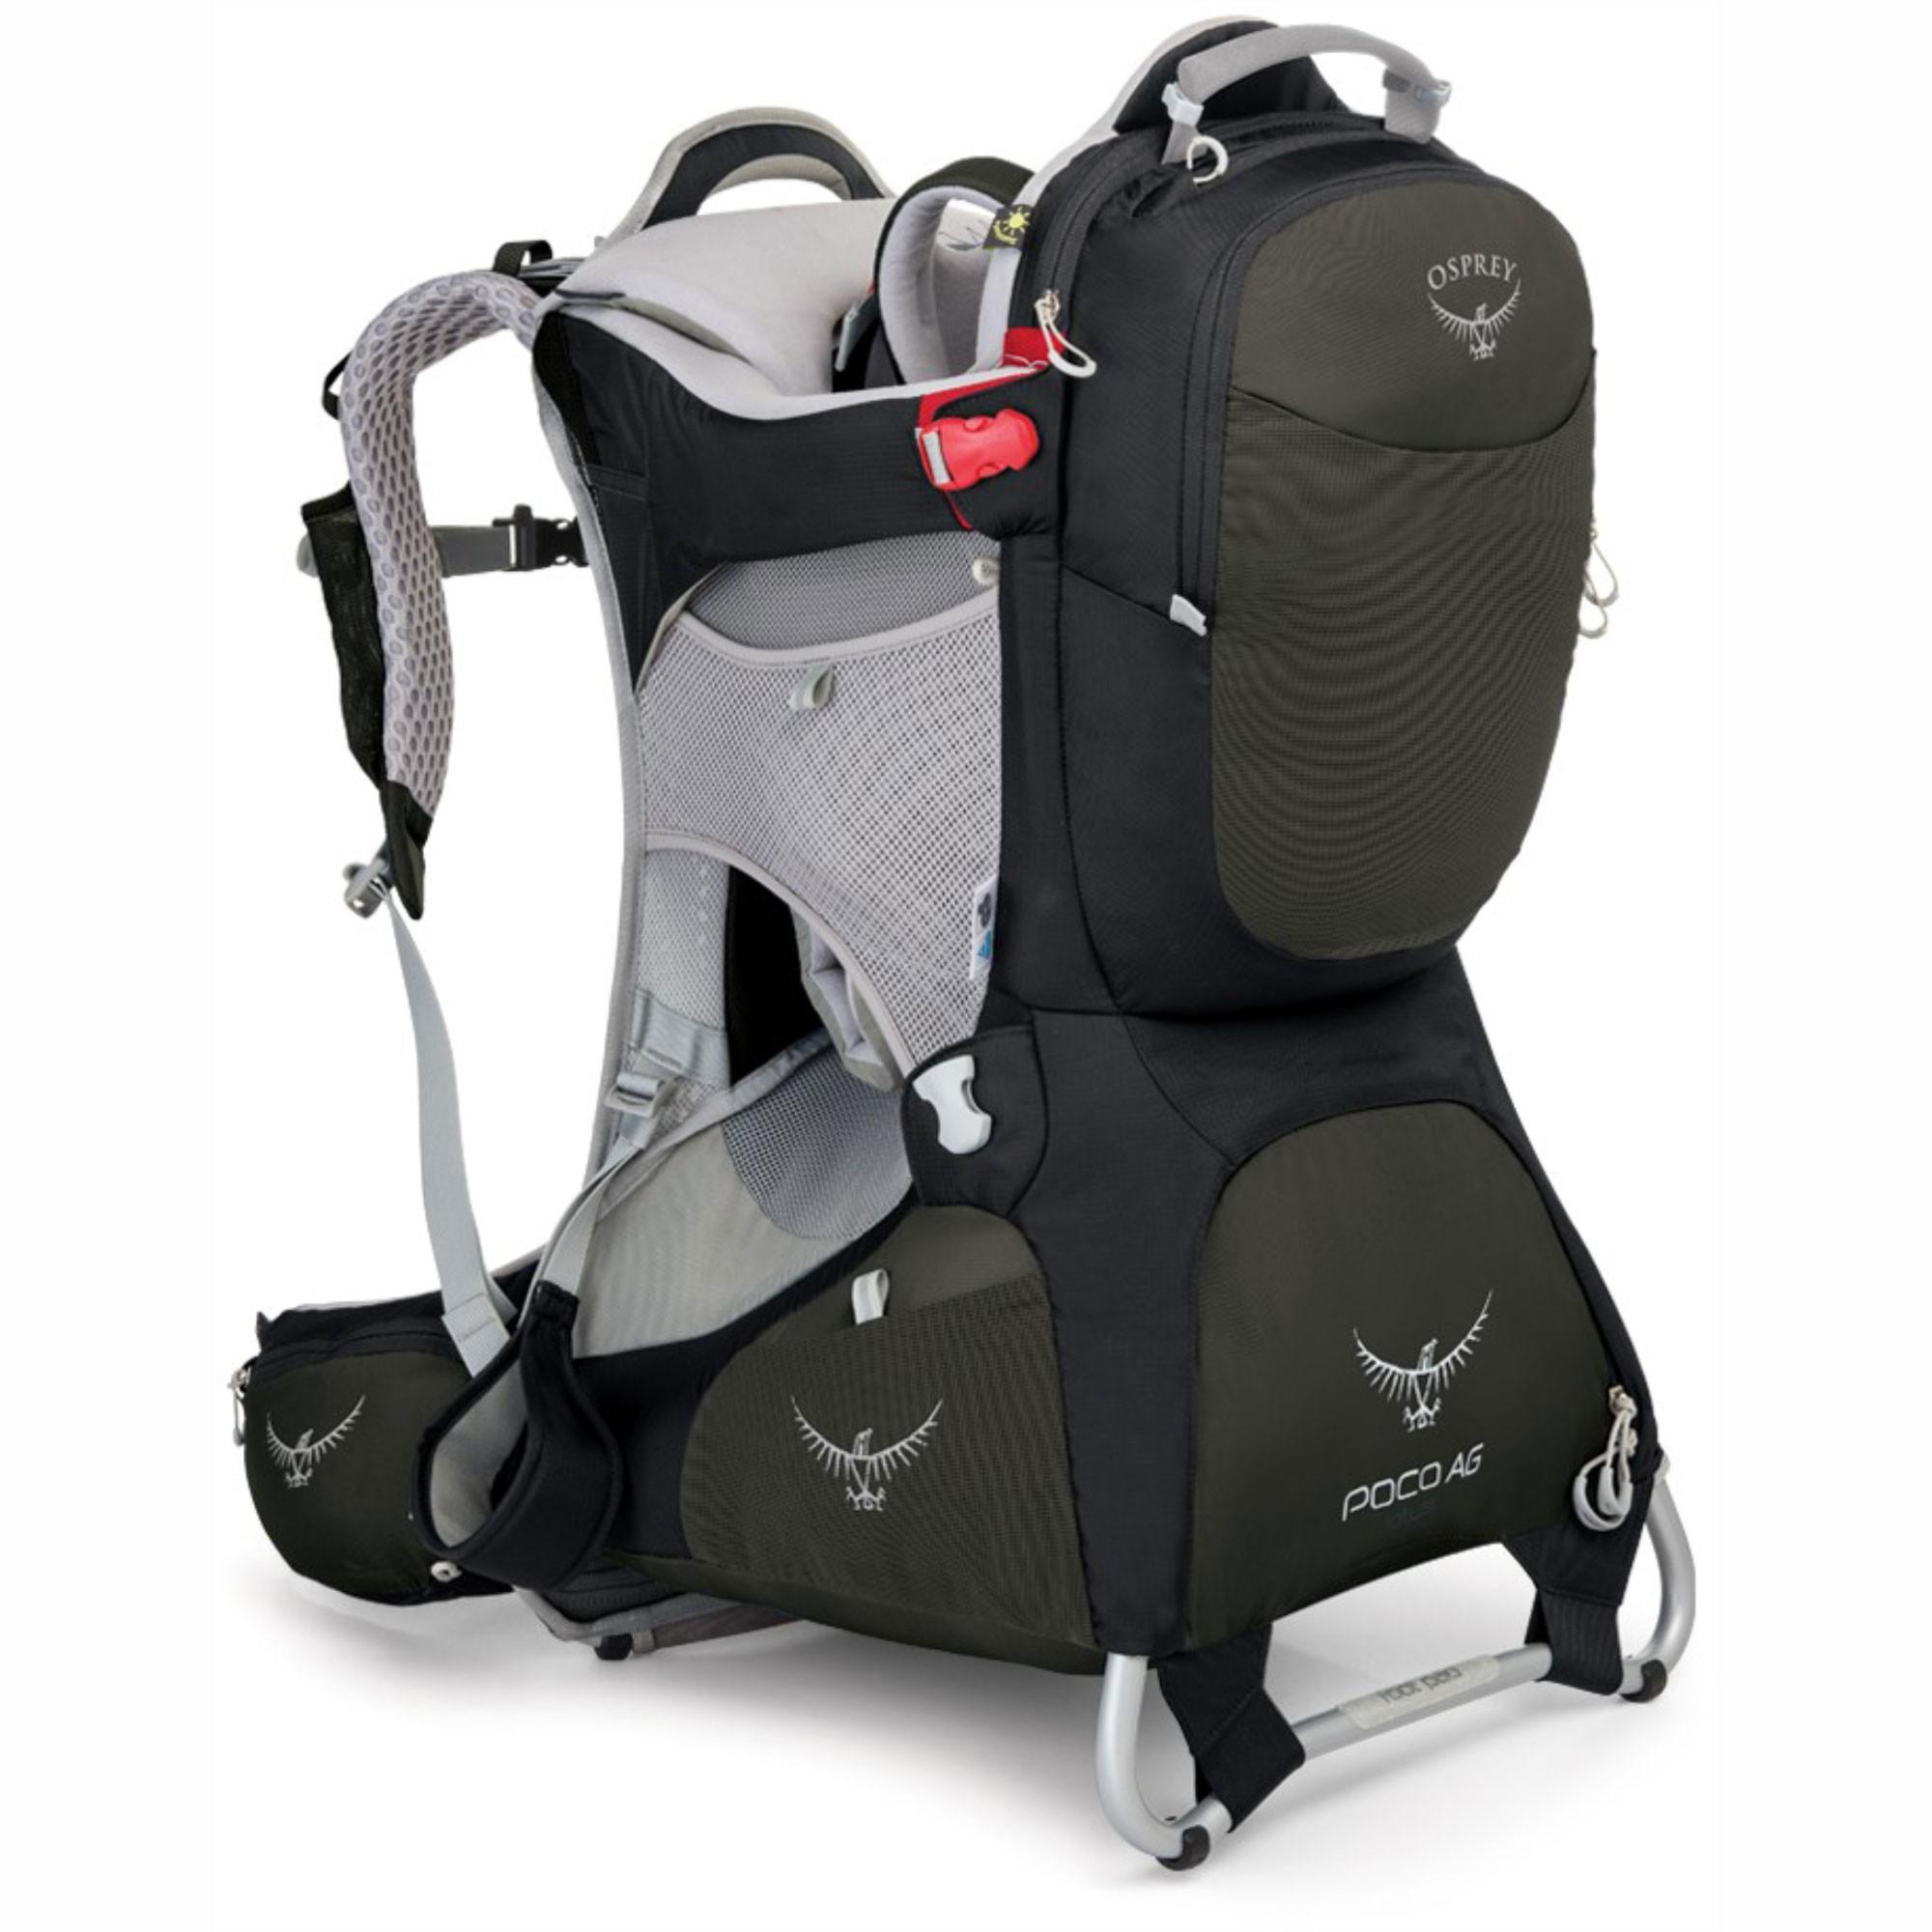 Osprey Poco AG Plus Child Carrier - Black